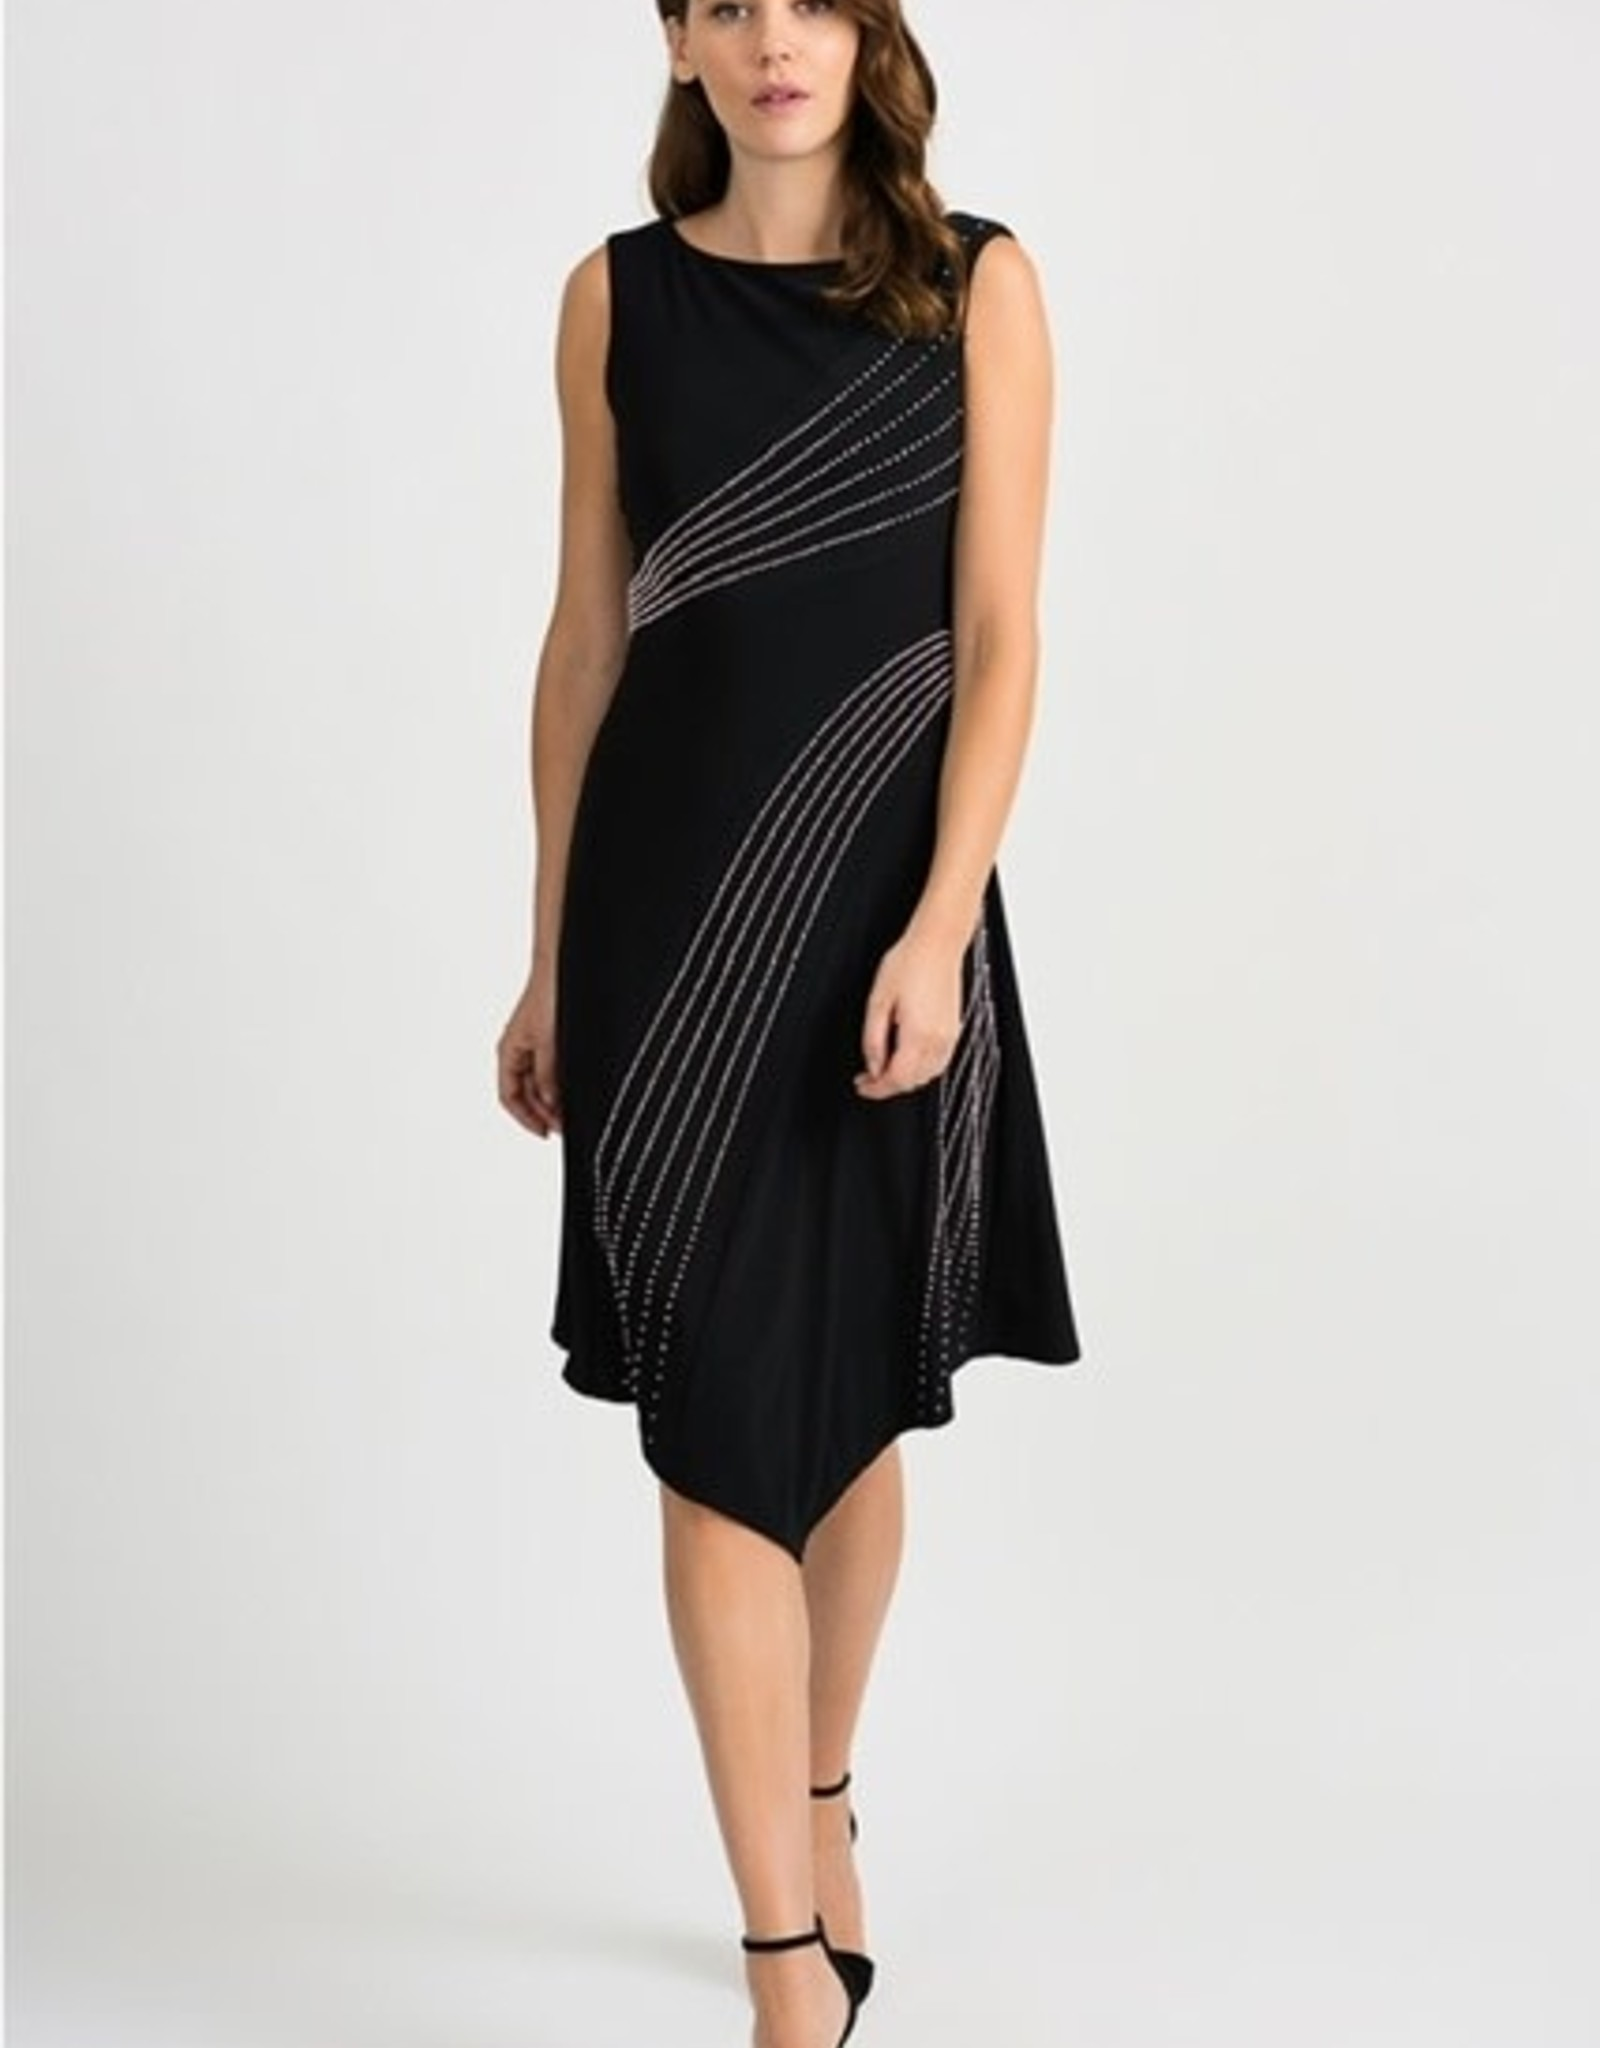 Joseph Ribkoff Joseph Ribkoff sleeveless Dress with rose gold beading 201124